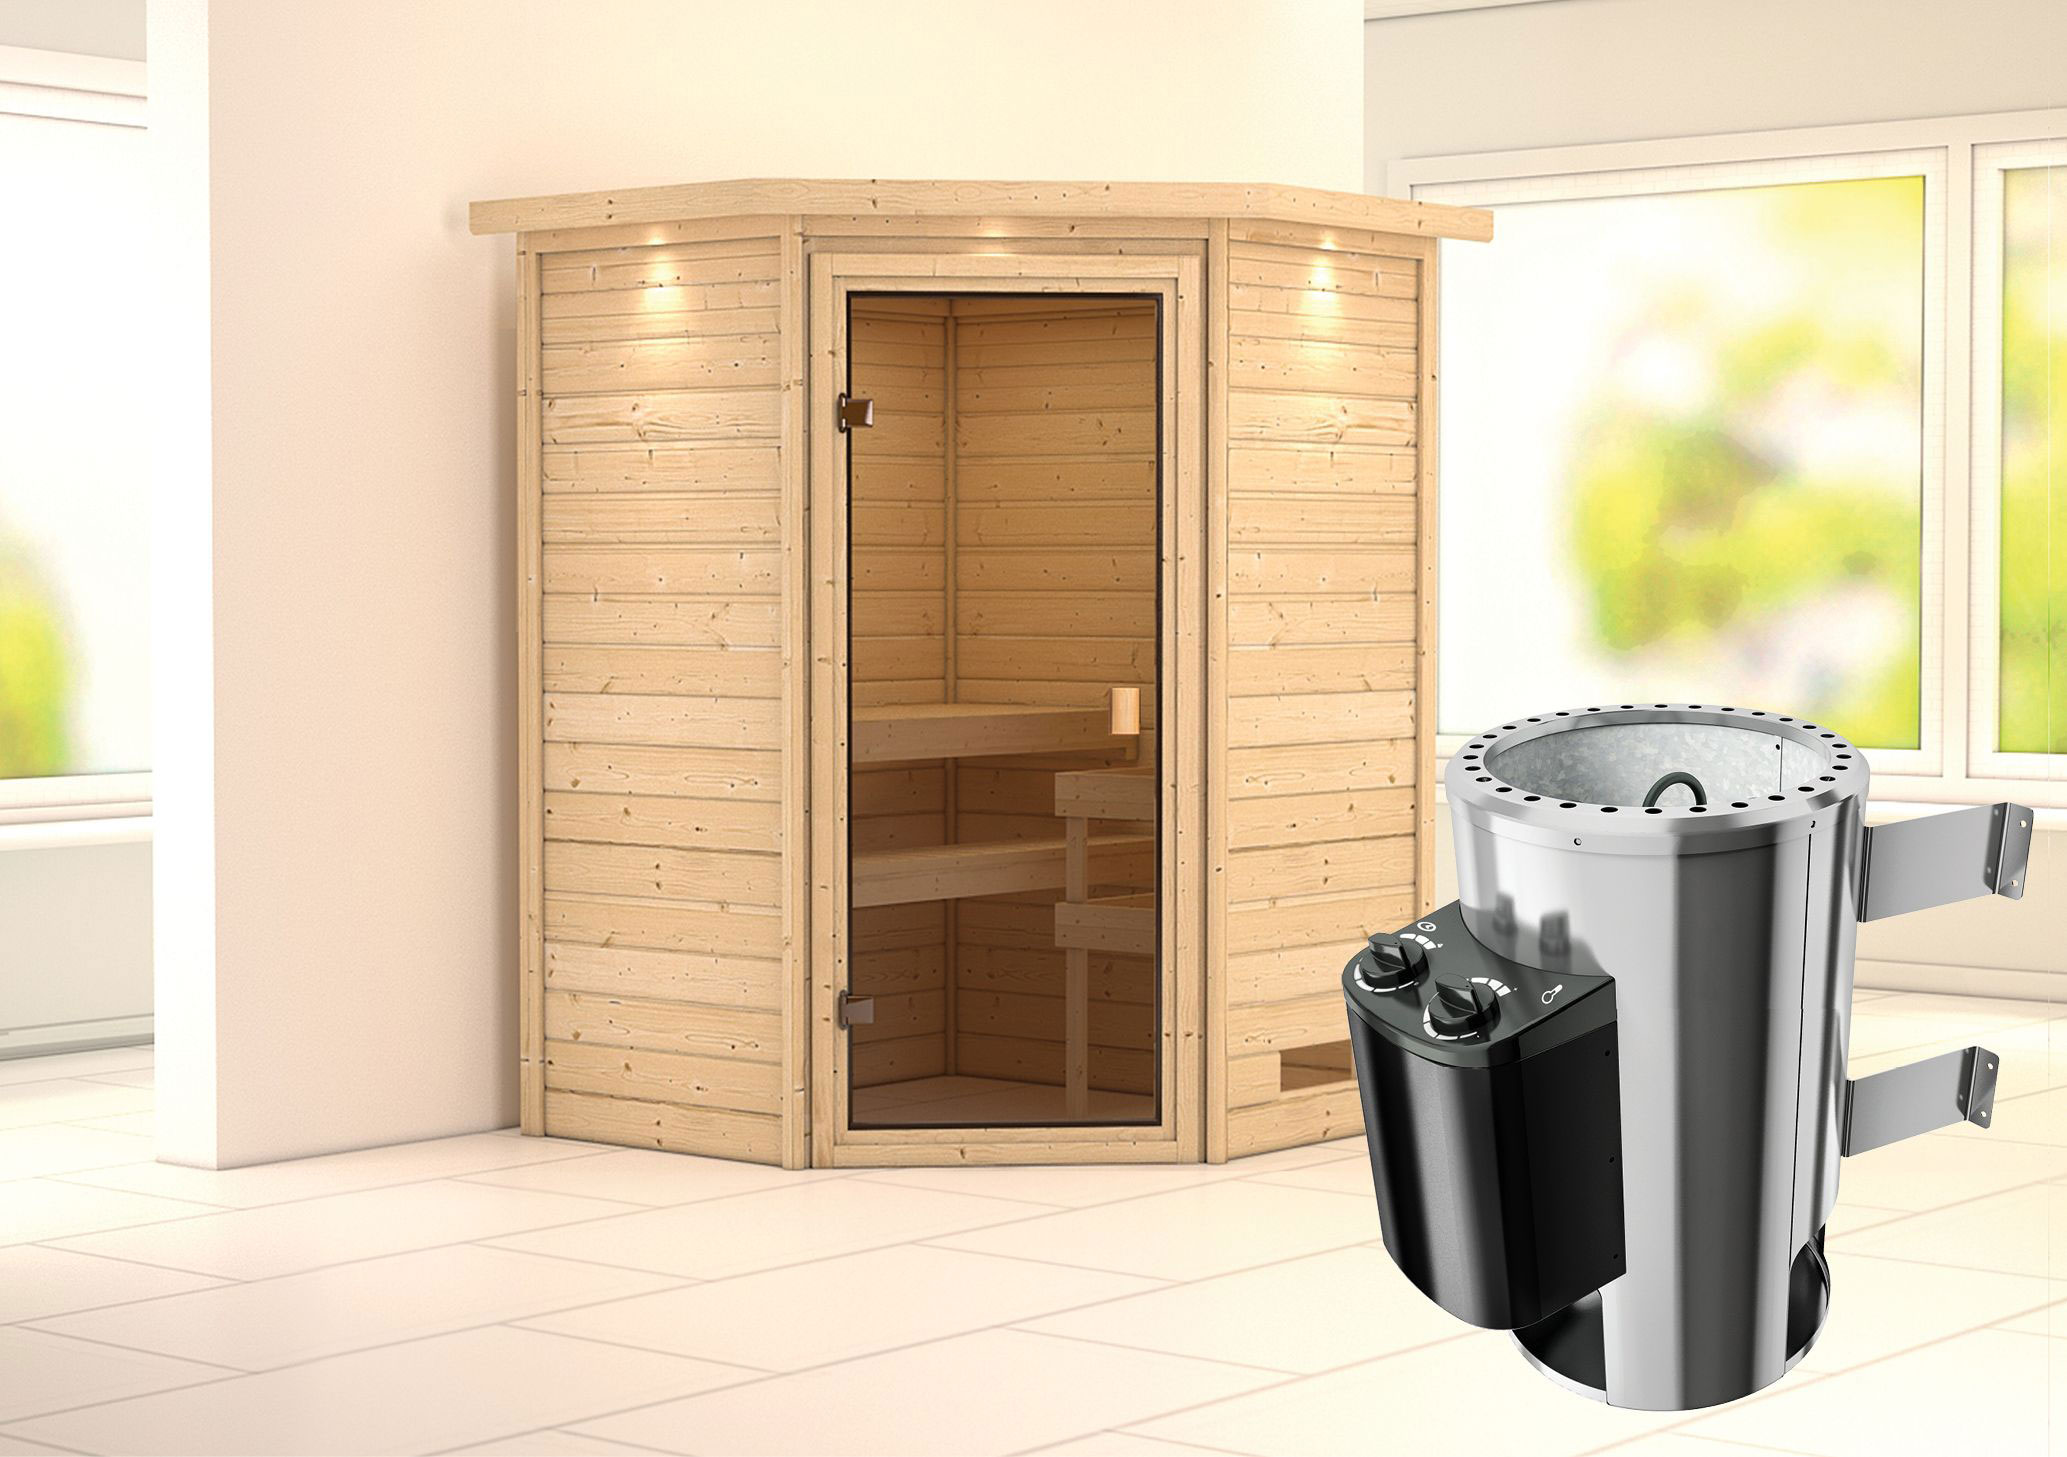 Karibu Sauna Alicja 38mm 230V Dachkranz + Ofen 3,6kW intern classicTür Bild 1